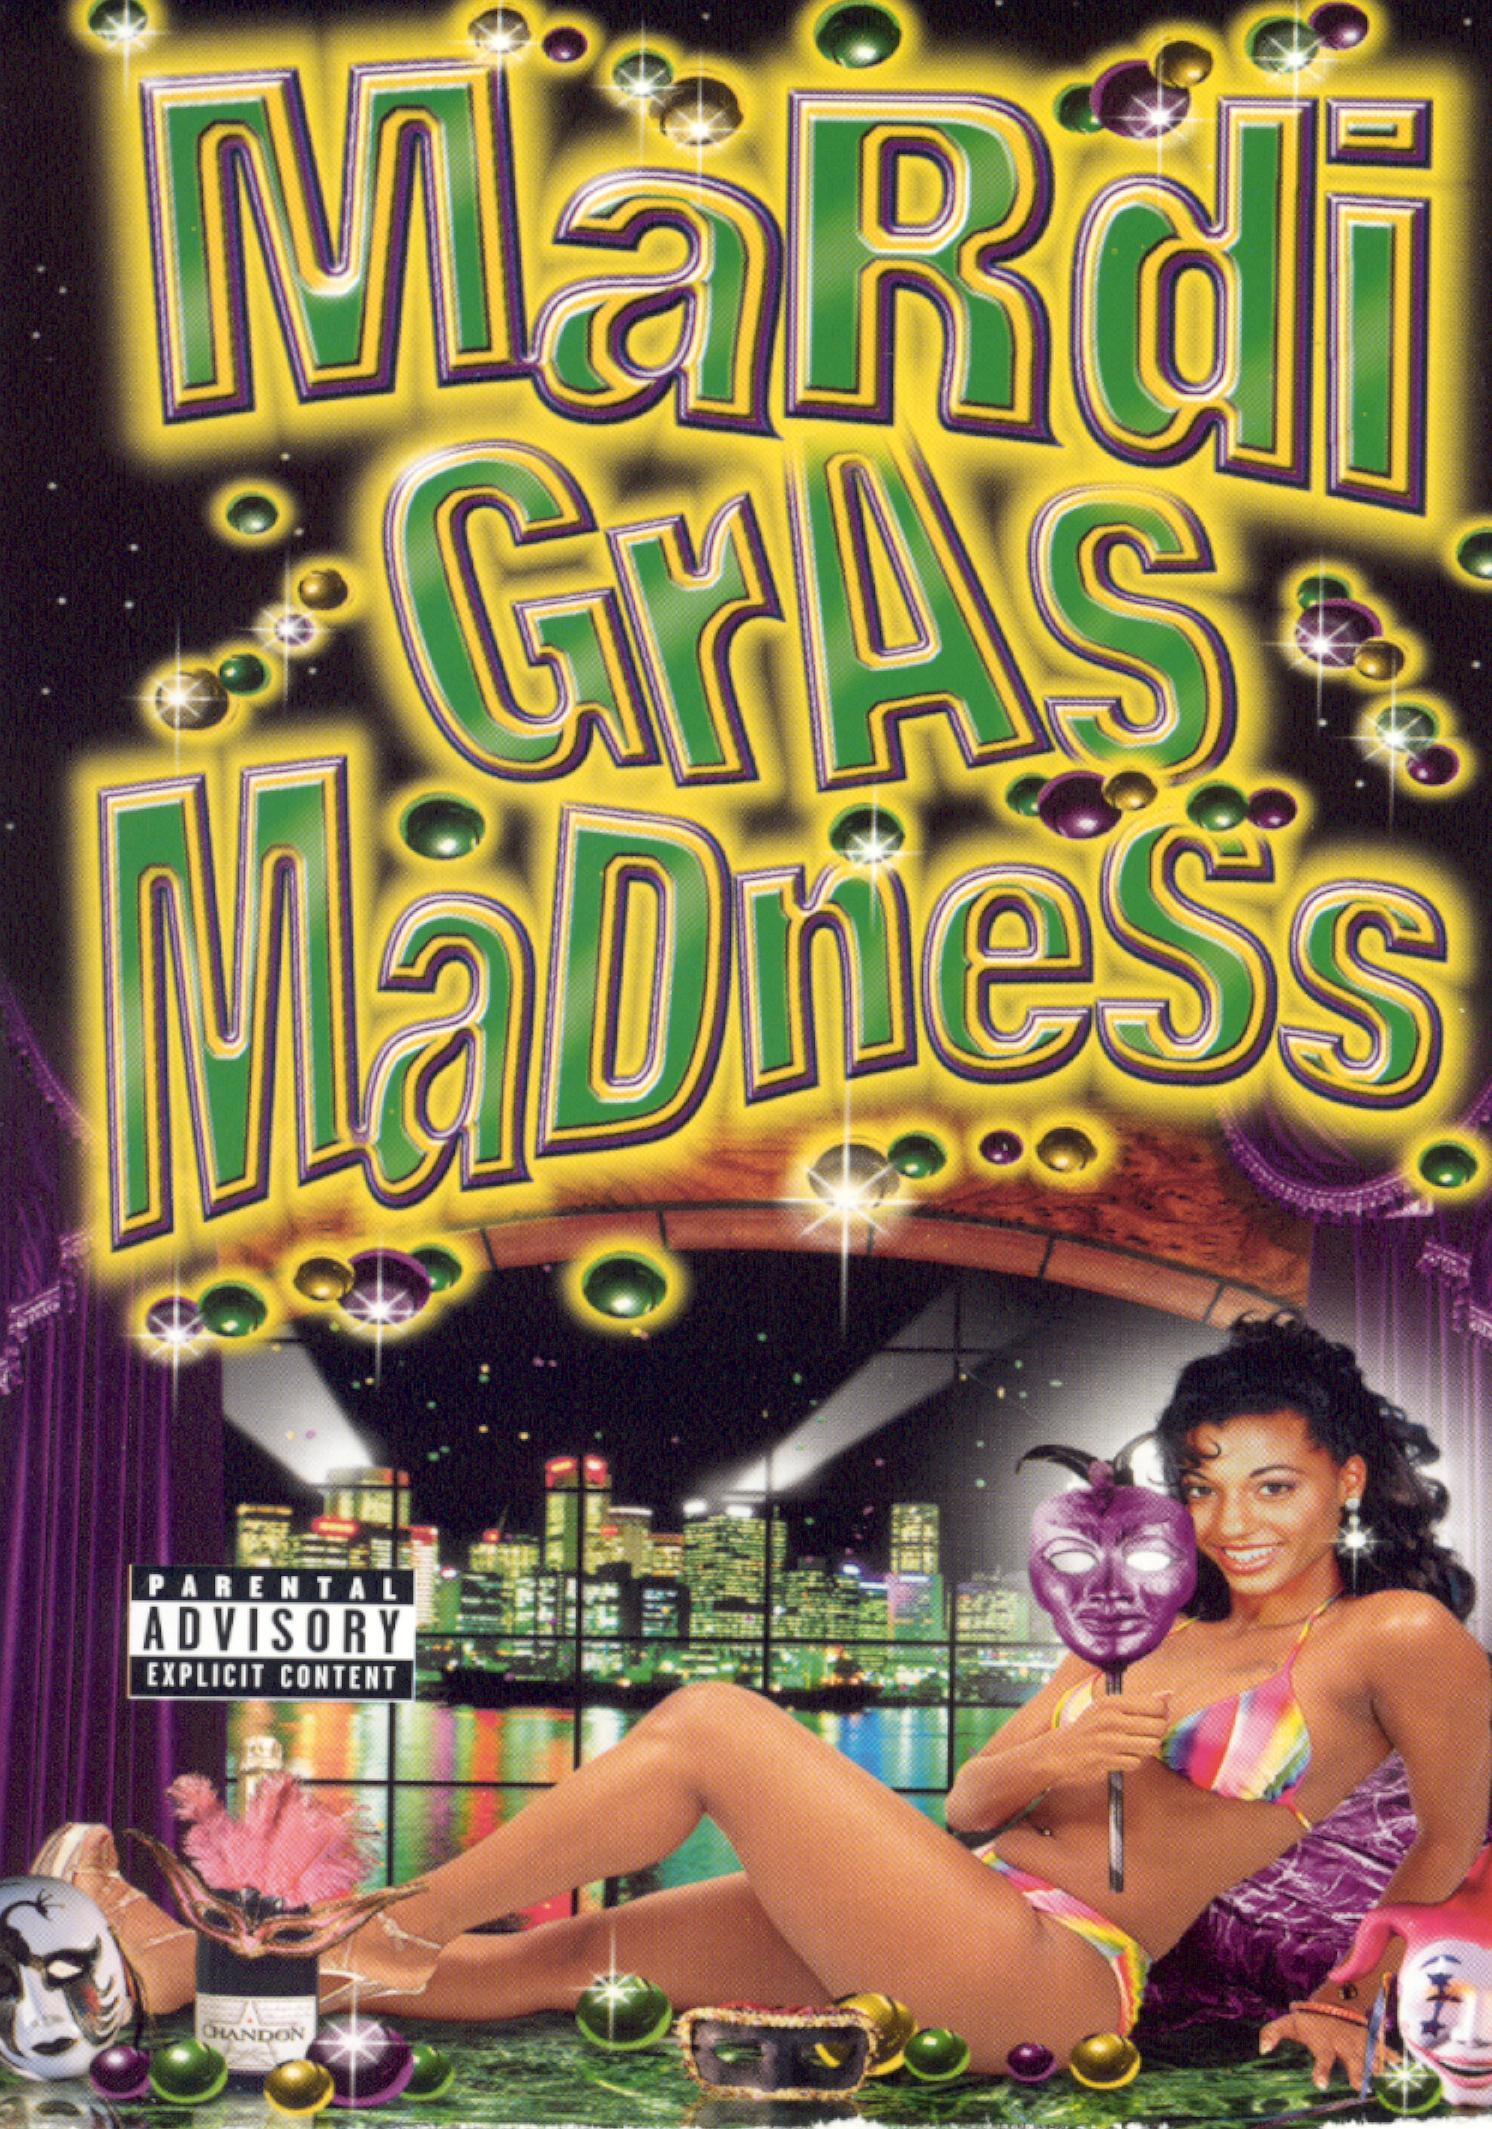 Mardi Gras Madness (2001)